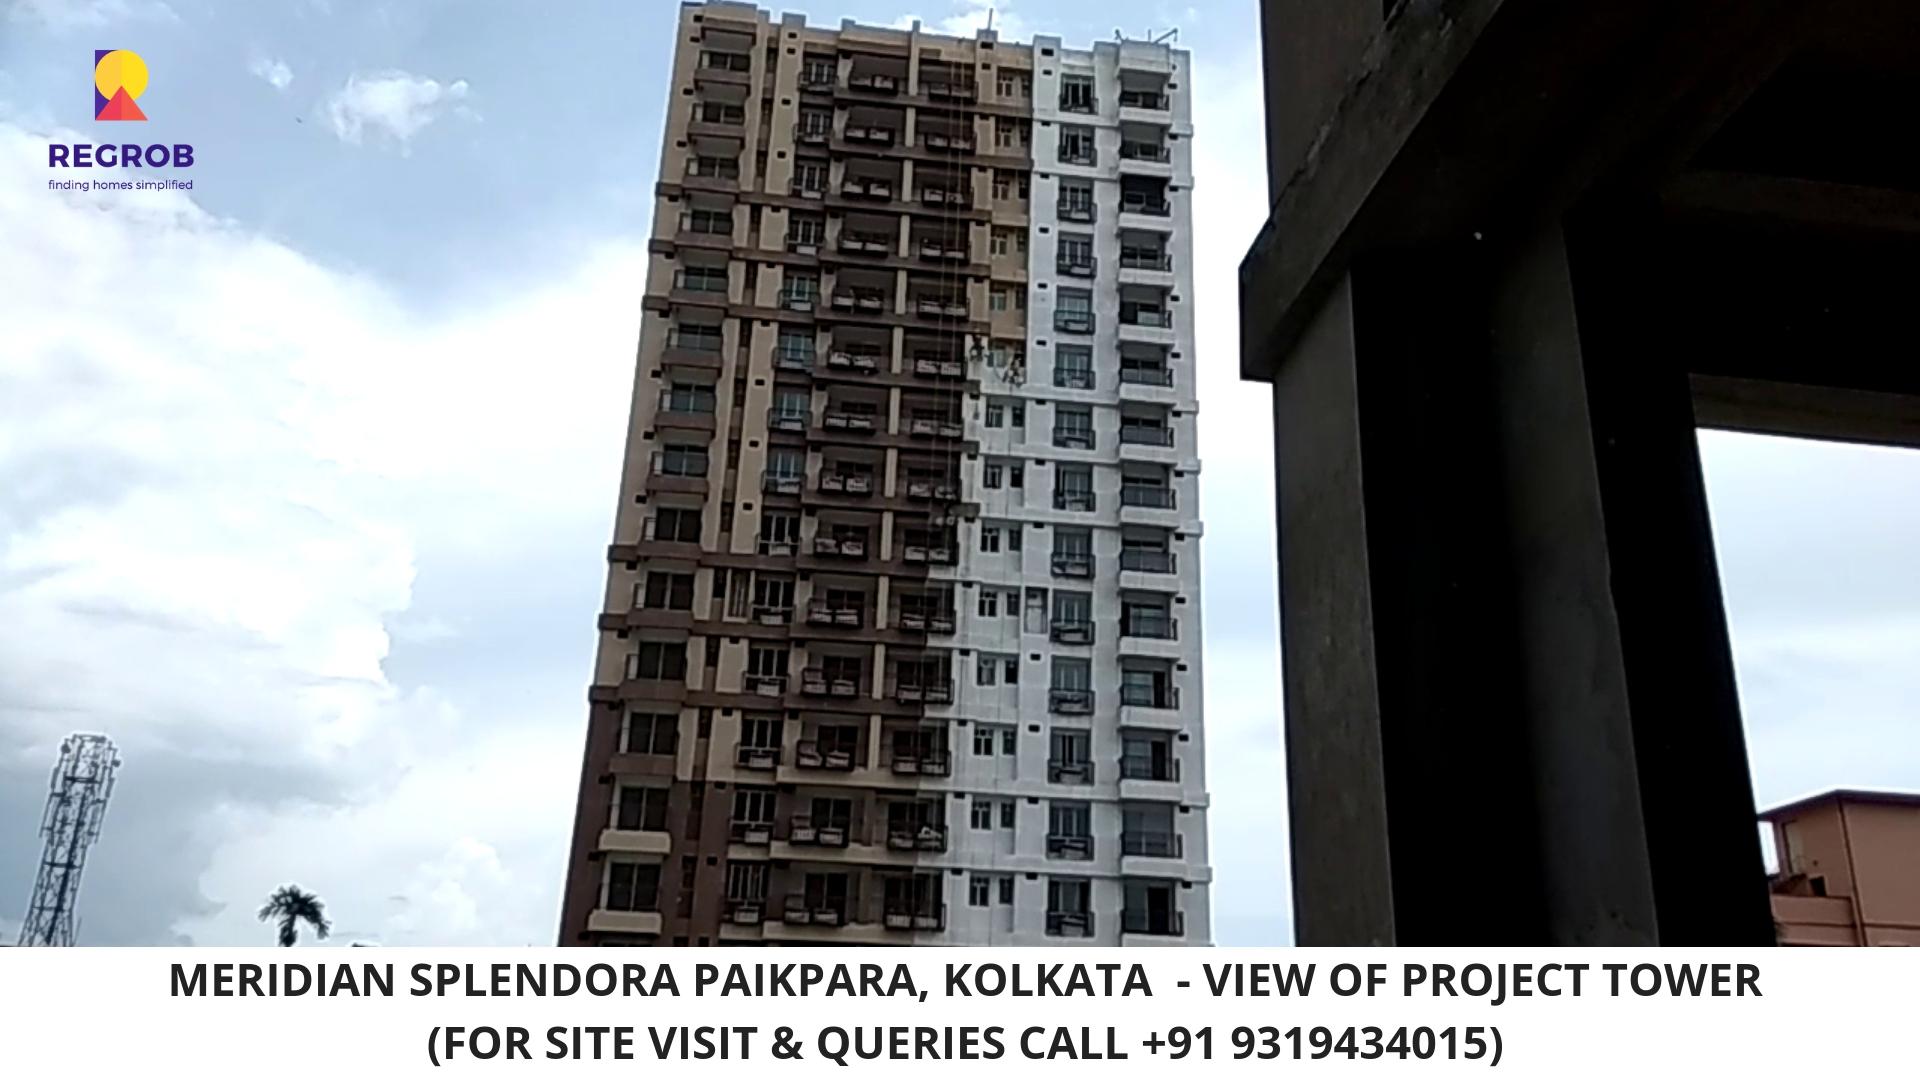 Meridian Splendora Paikpara Kolkata